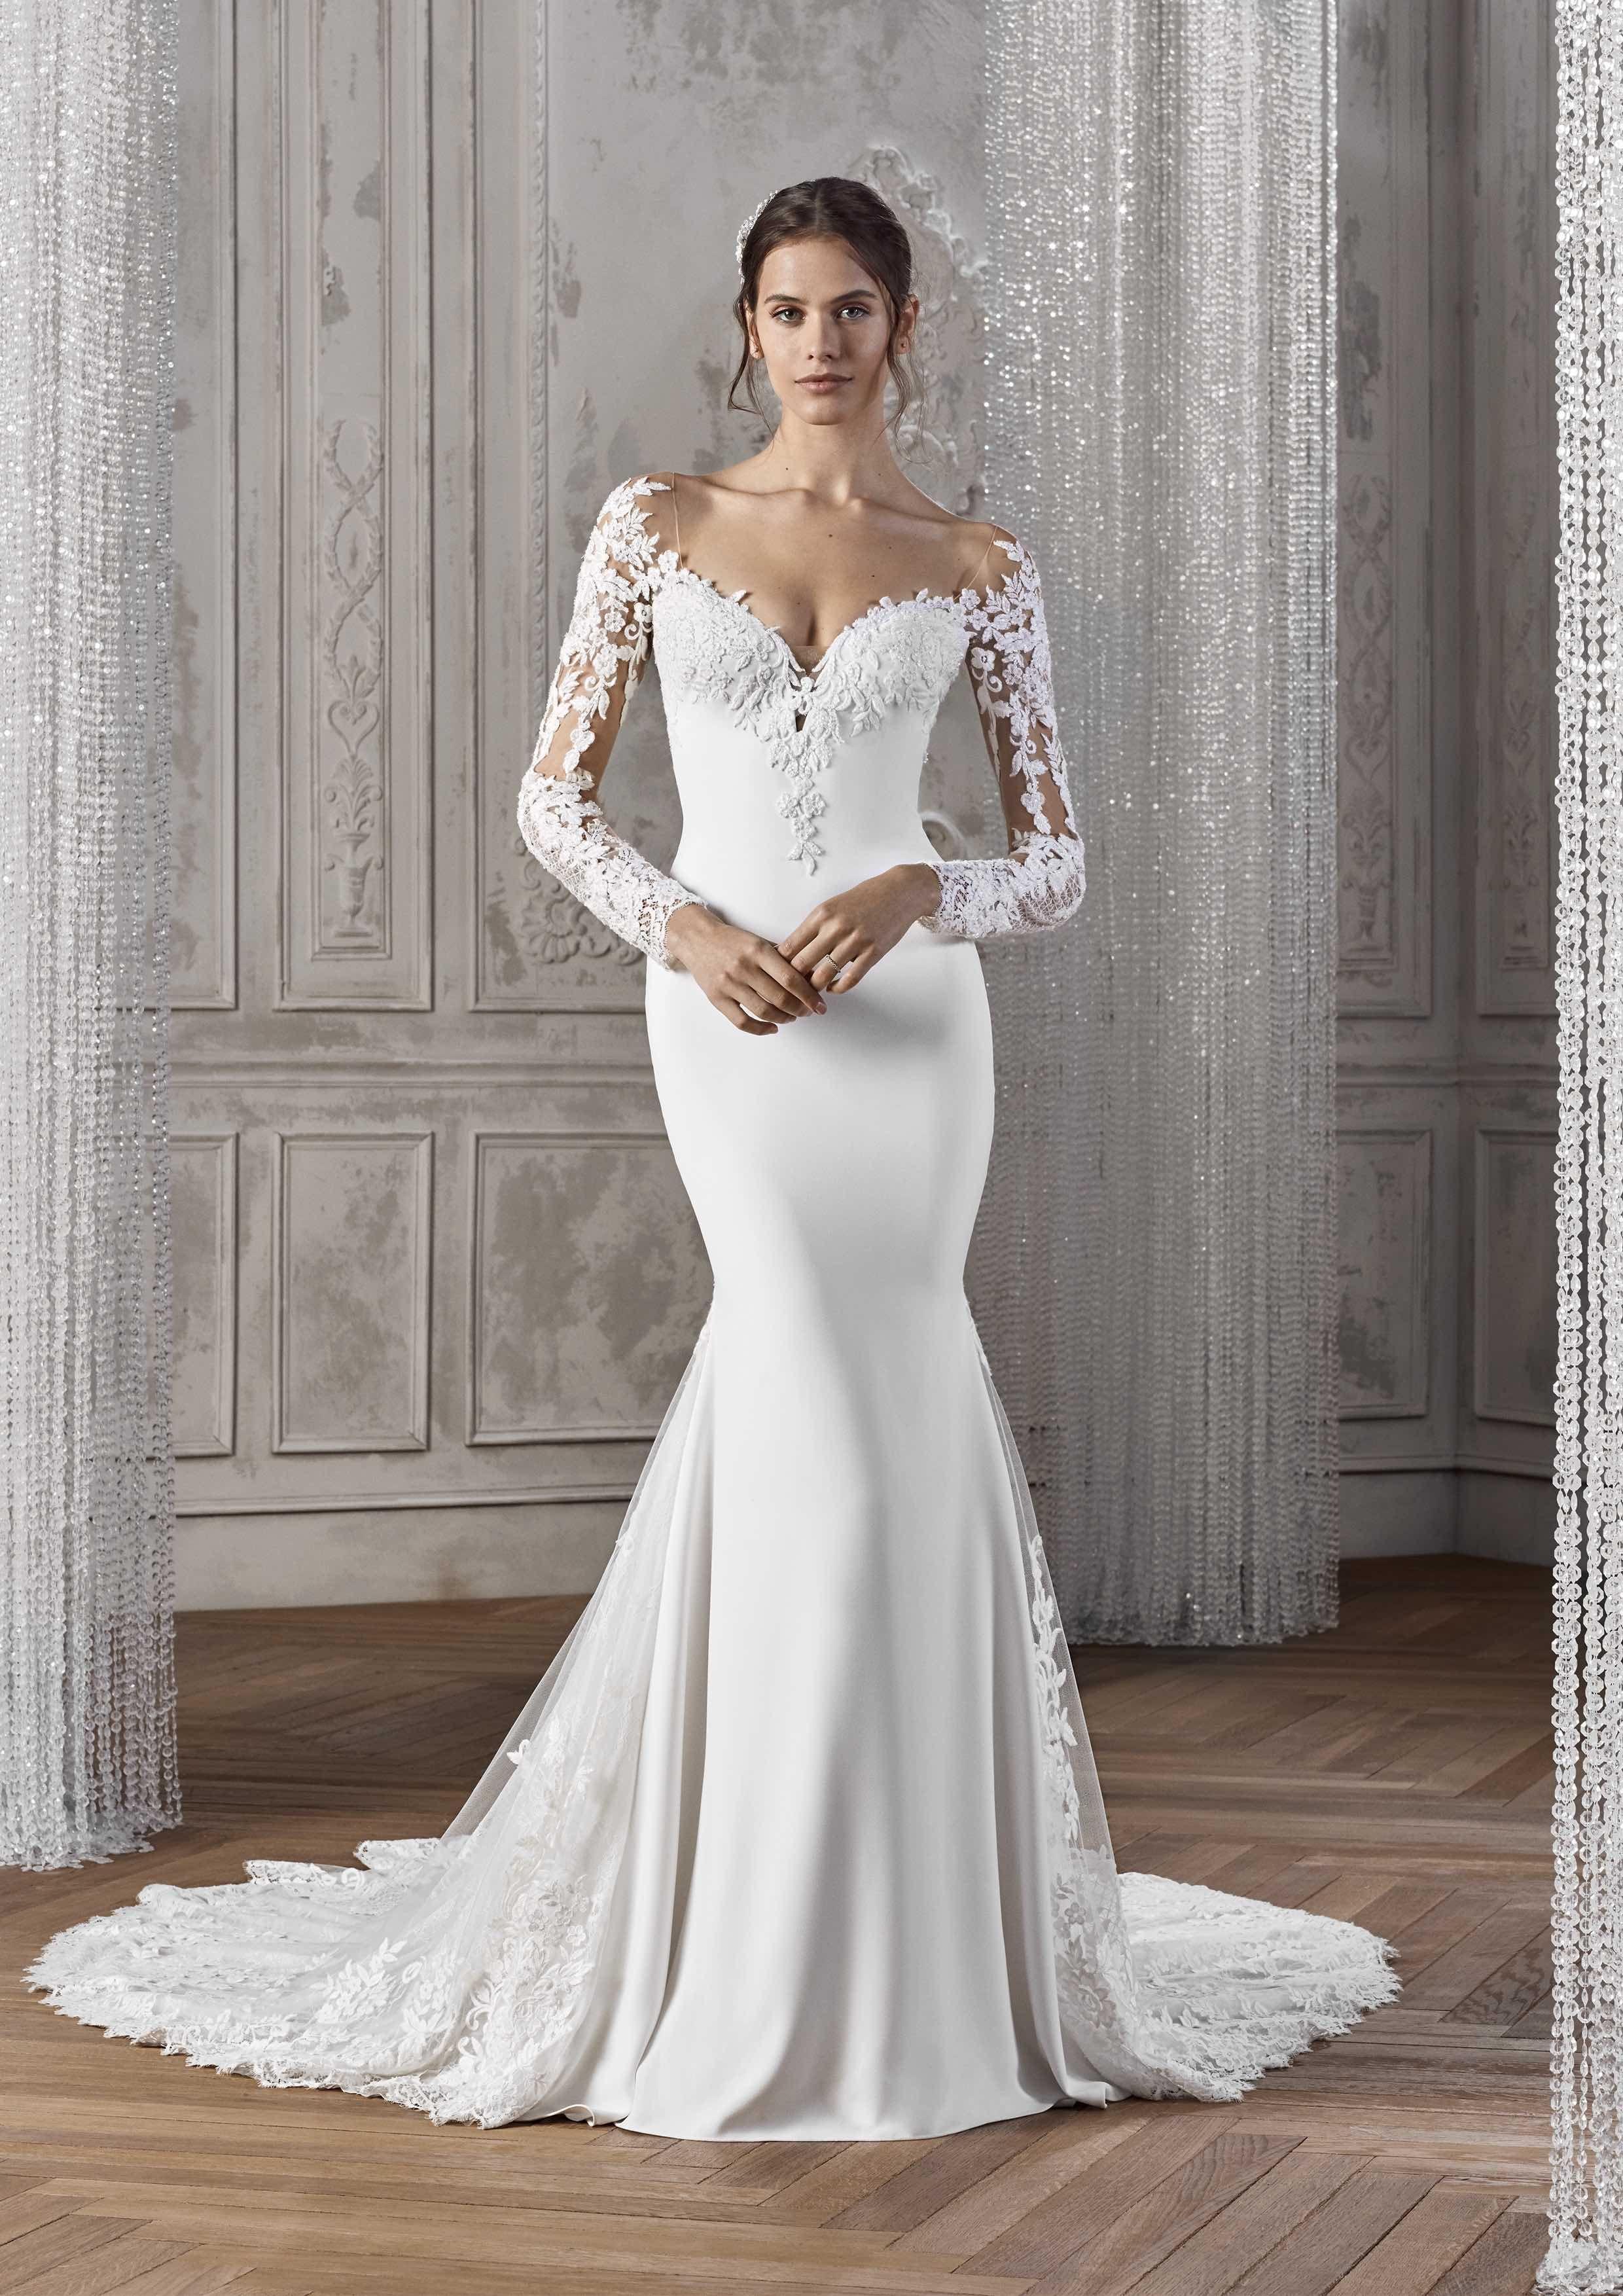 KARAH ST PATRICK STUDIO 2019 OFF WHITE WEDDING DRESS LUV BRIDAL AUSTRALIA 3a32b7ab243a